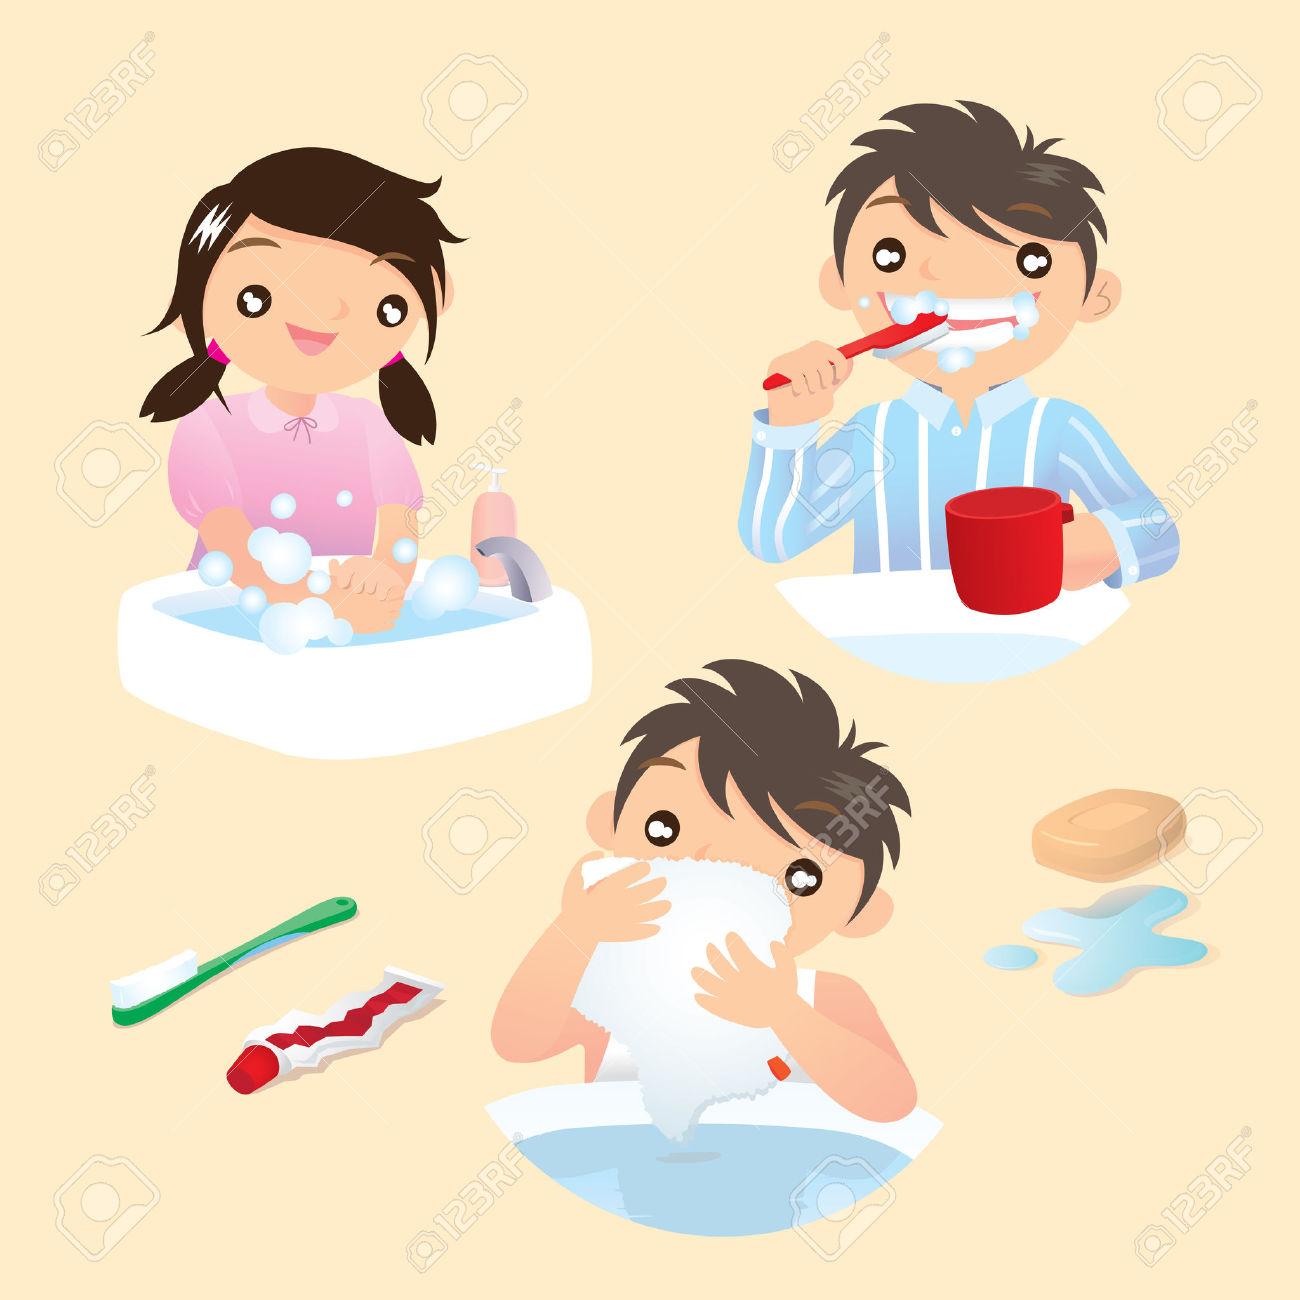 Washing hand in morning clipart jpg free stock Washing face in the morning kids clipart - ClipartFest jpg free stock